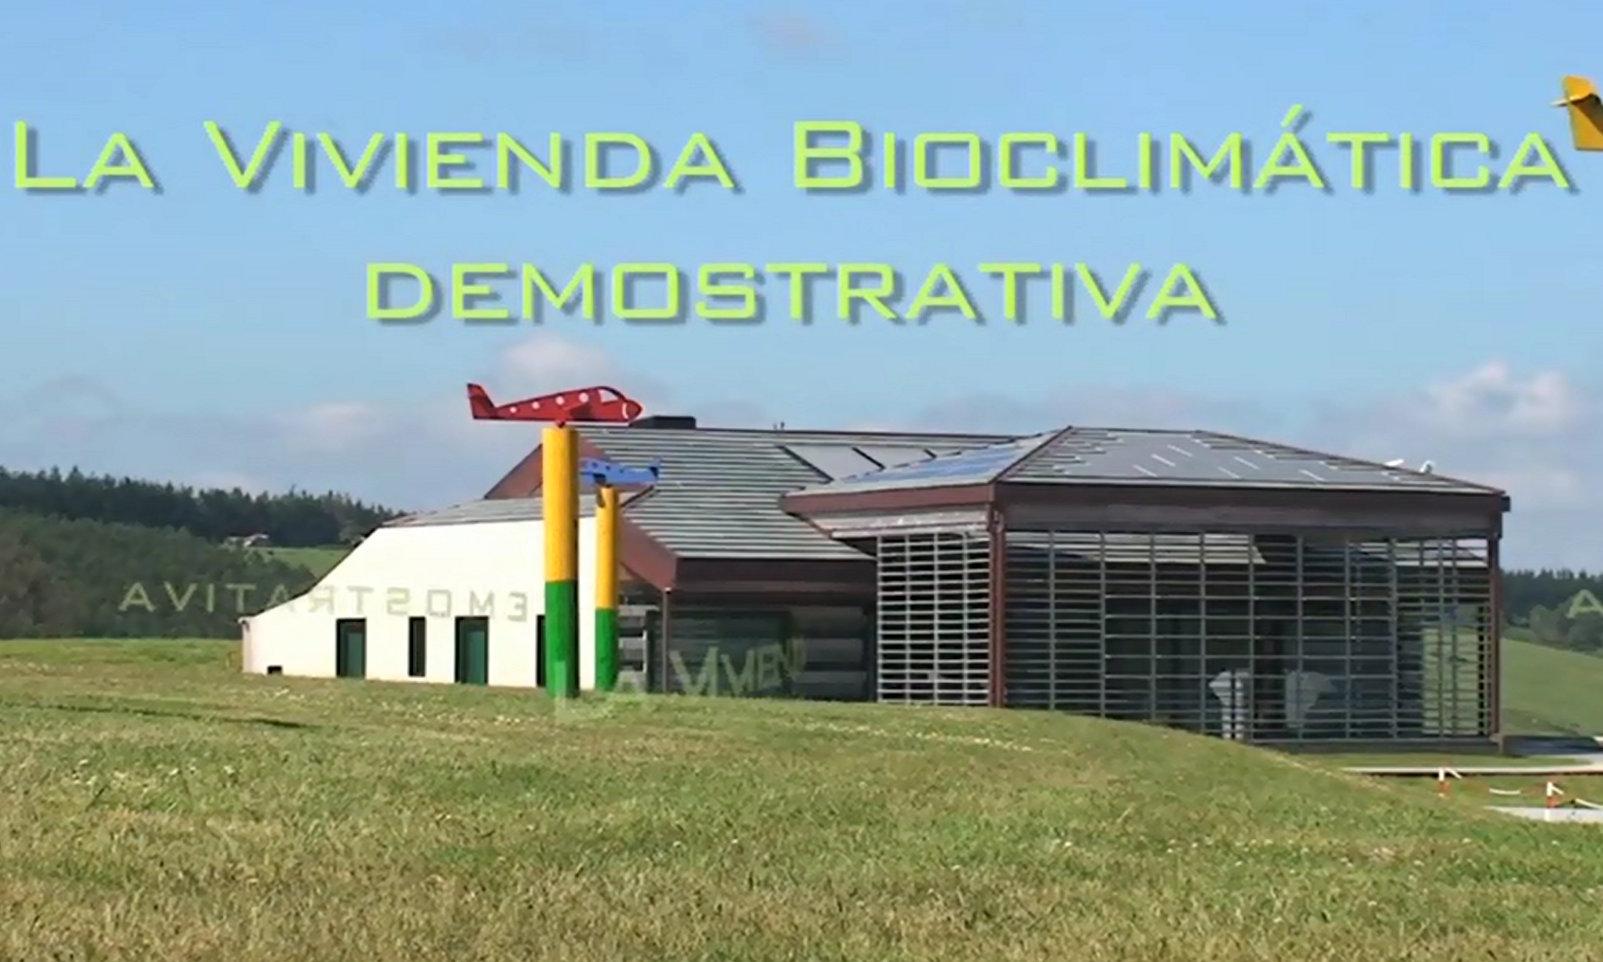 Vivienda bioclimática demostrativa